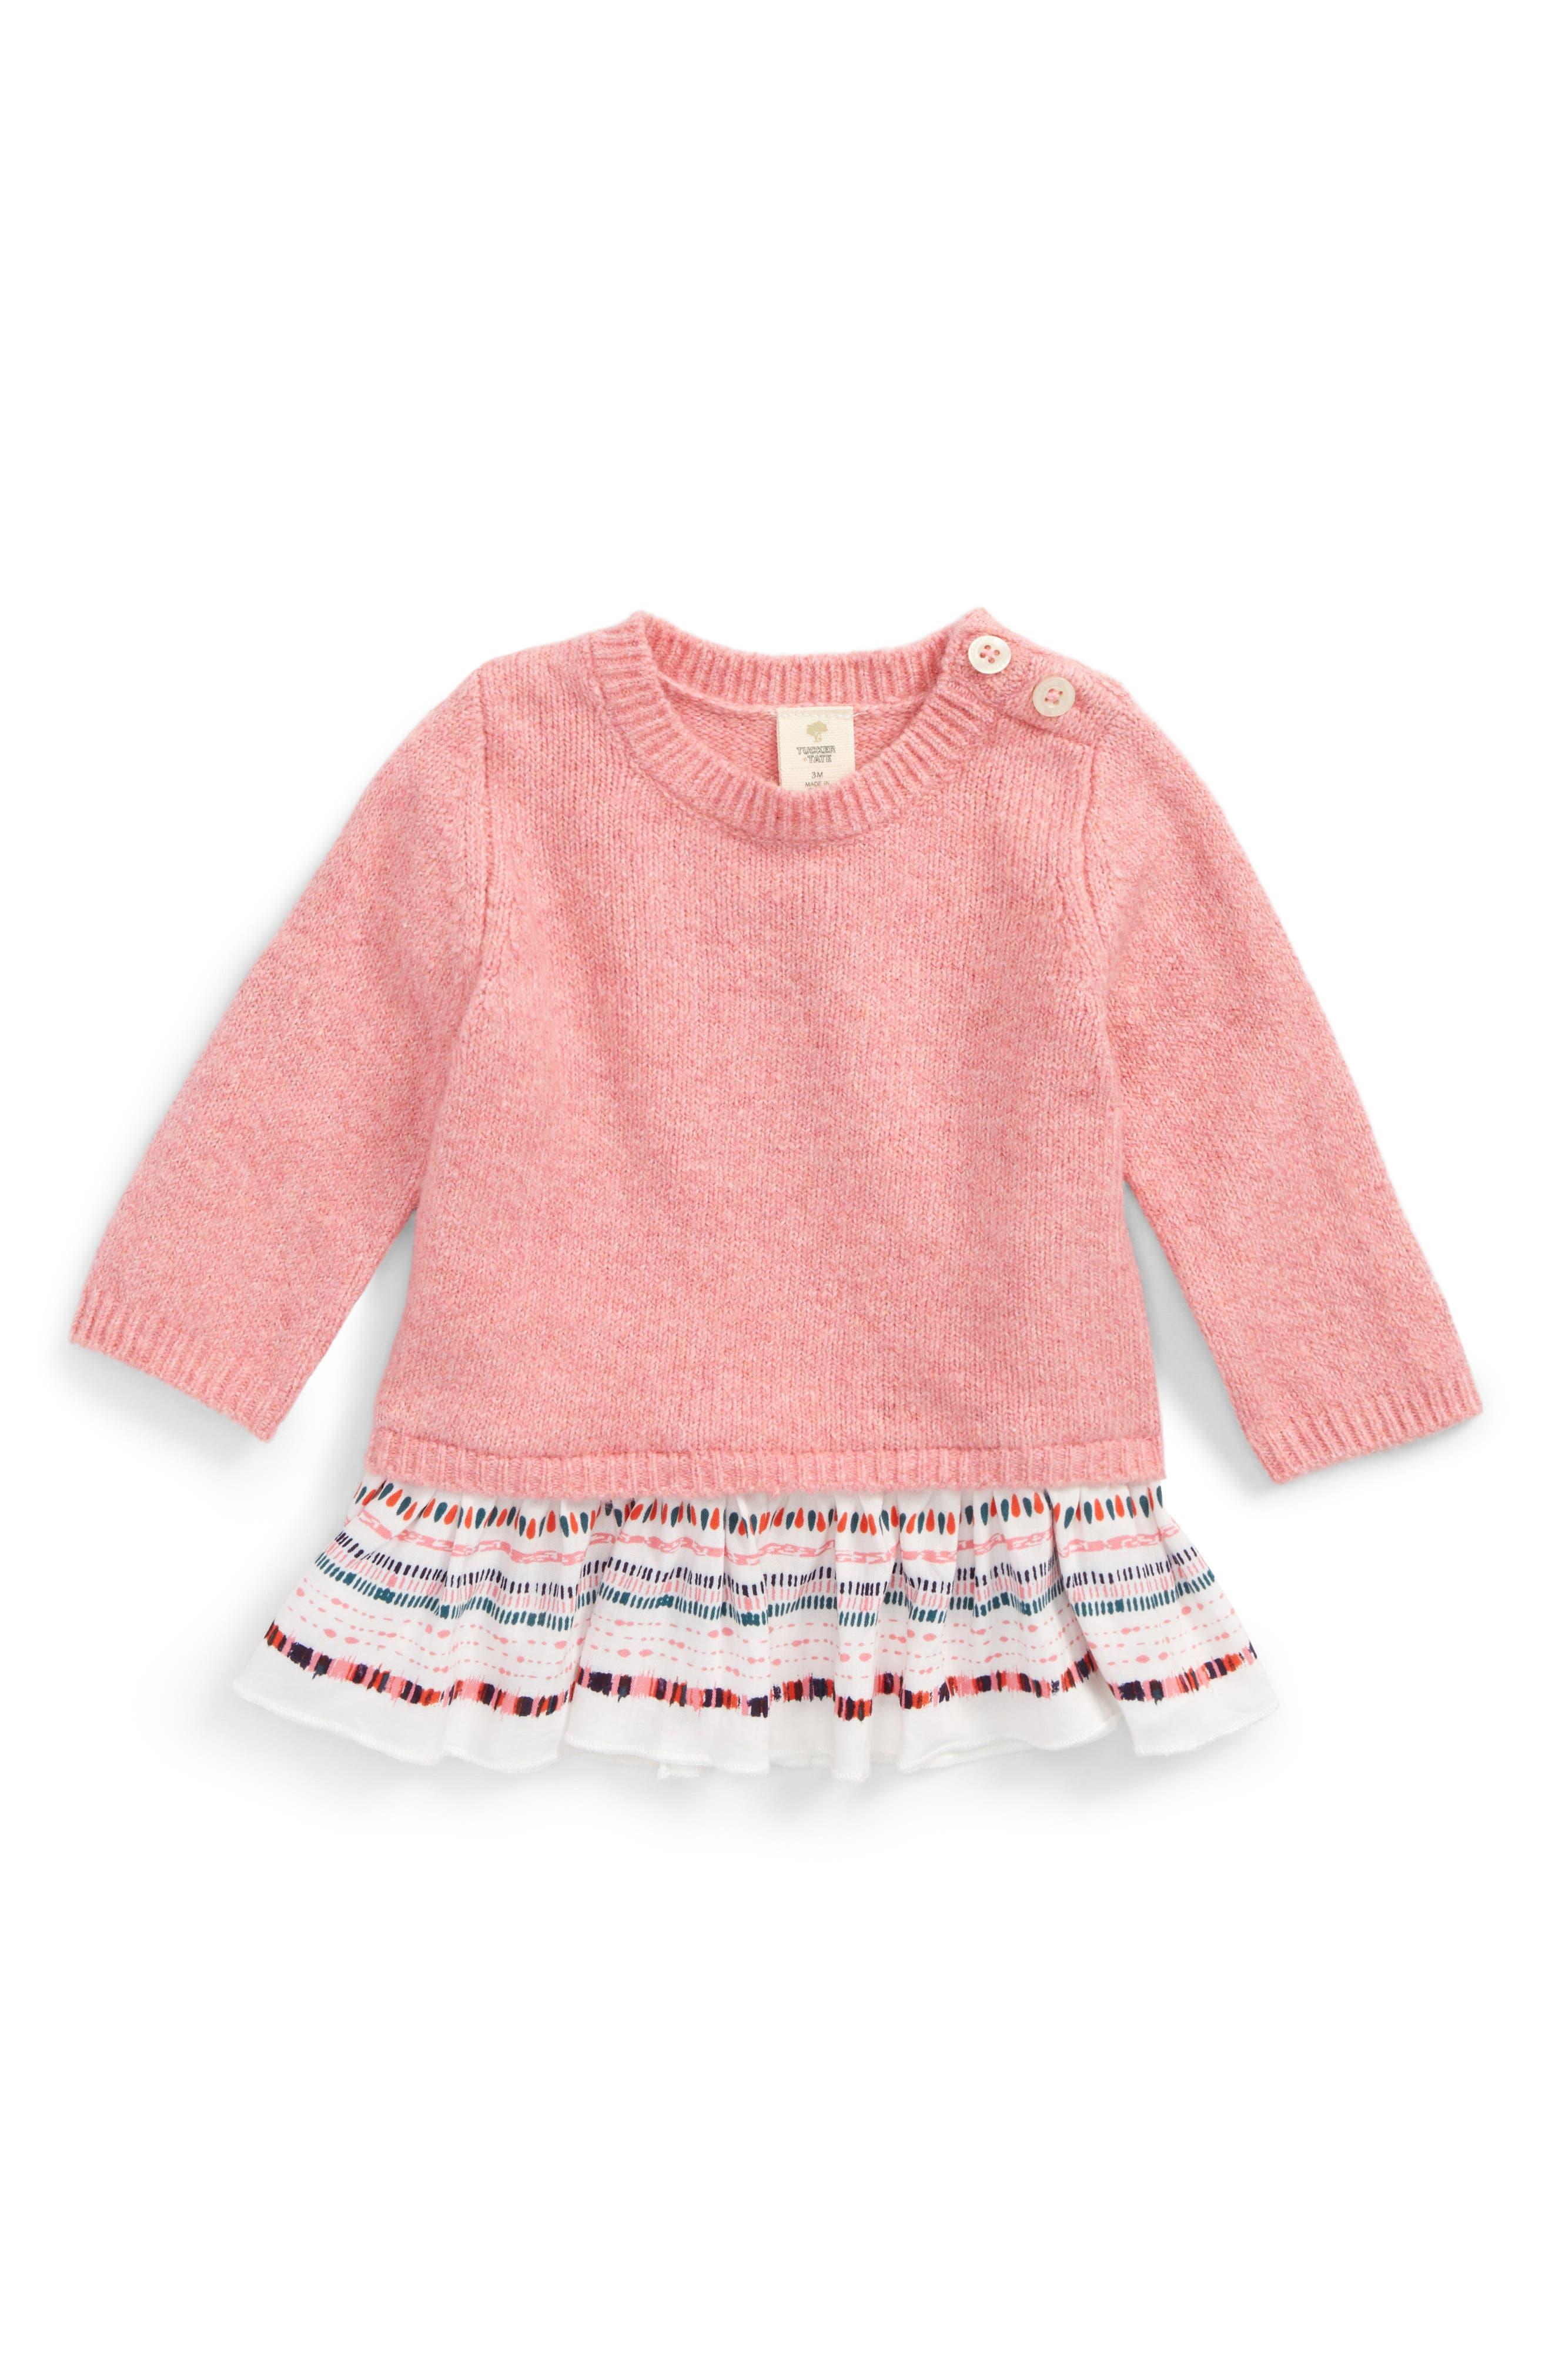 Ruffle Sweater,                         Main,                         color, Pink Lemonade Heather Geo